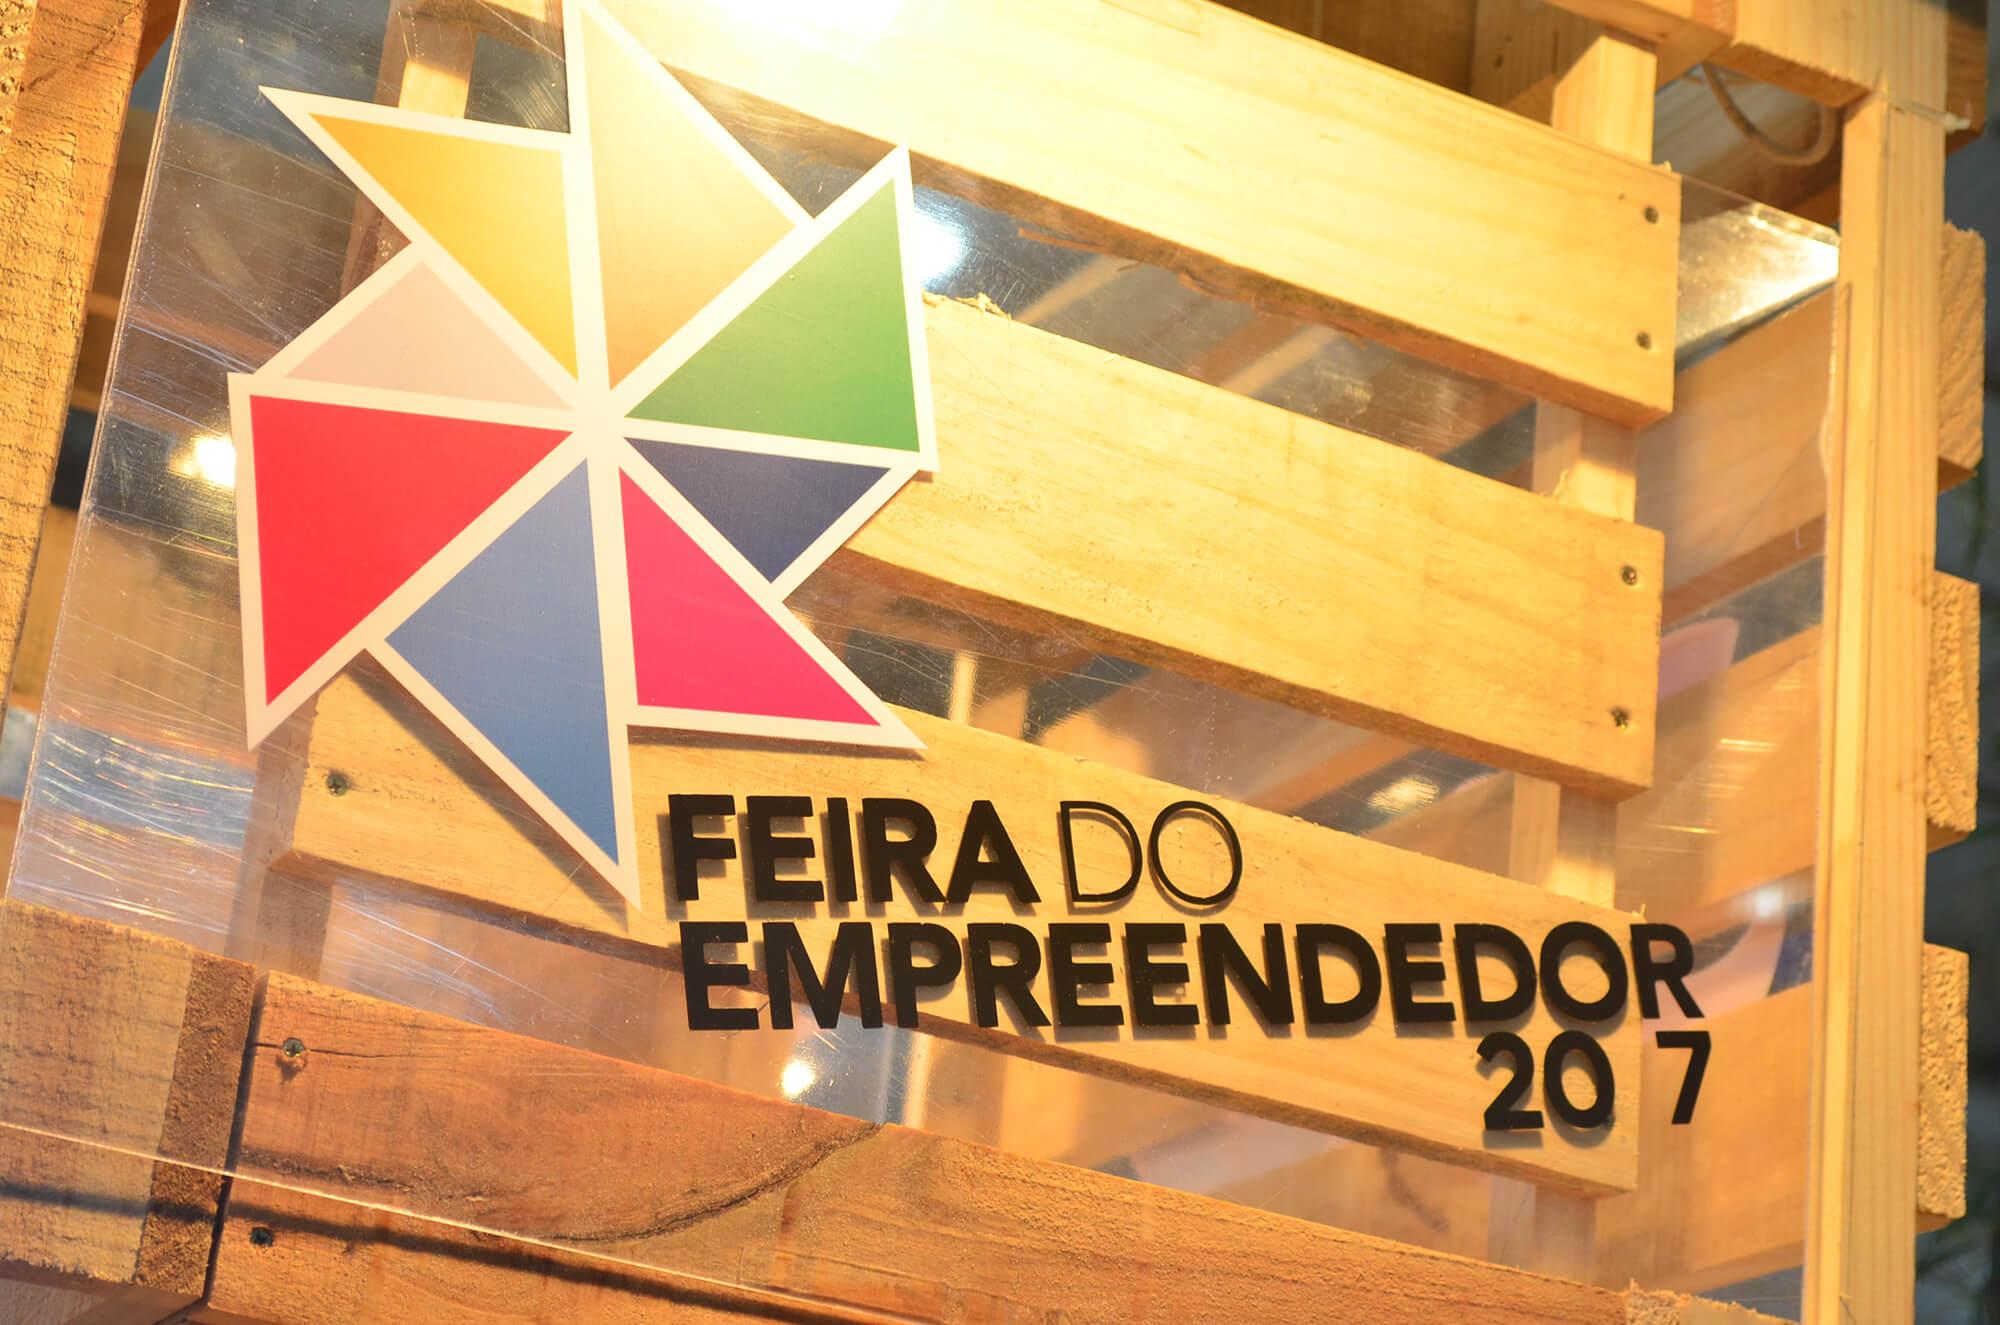 Feira do Empreendedor - SEBRAE/AL [2017]